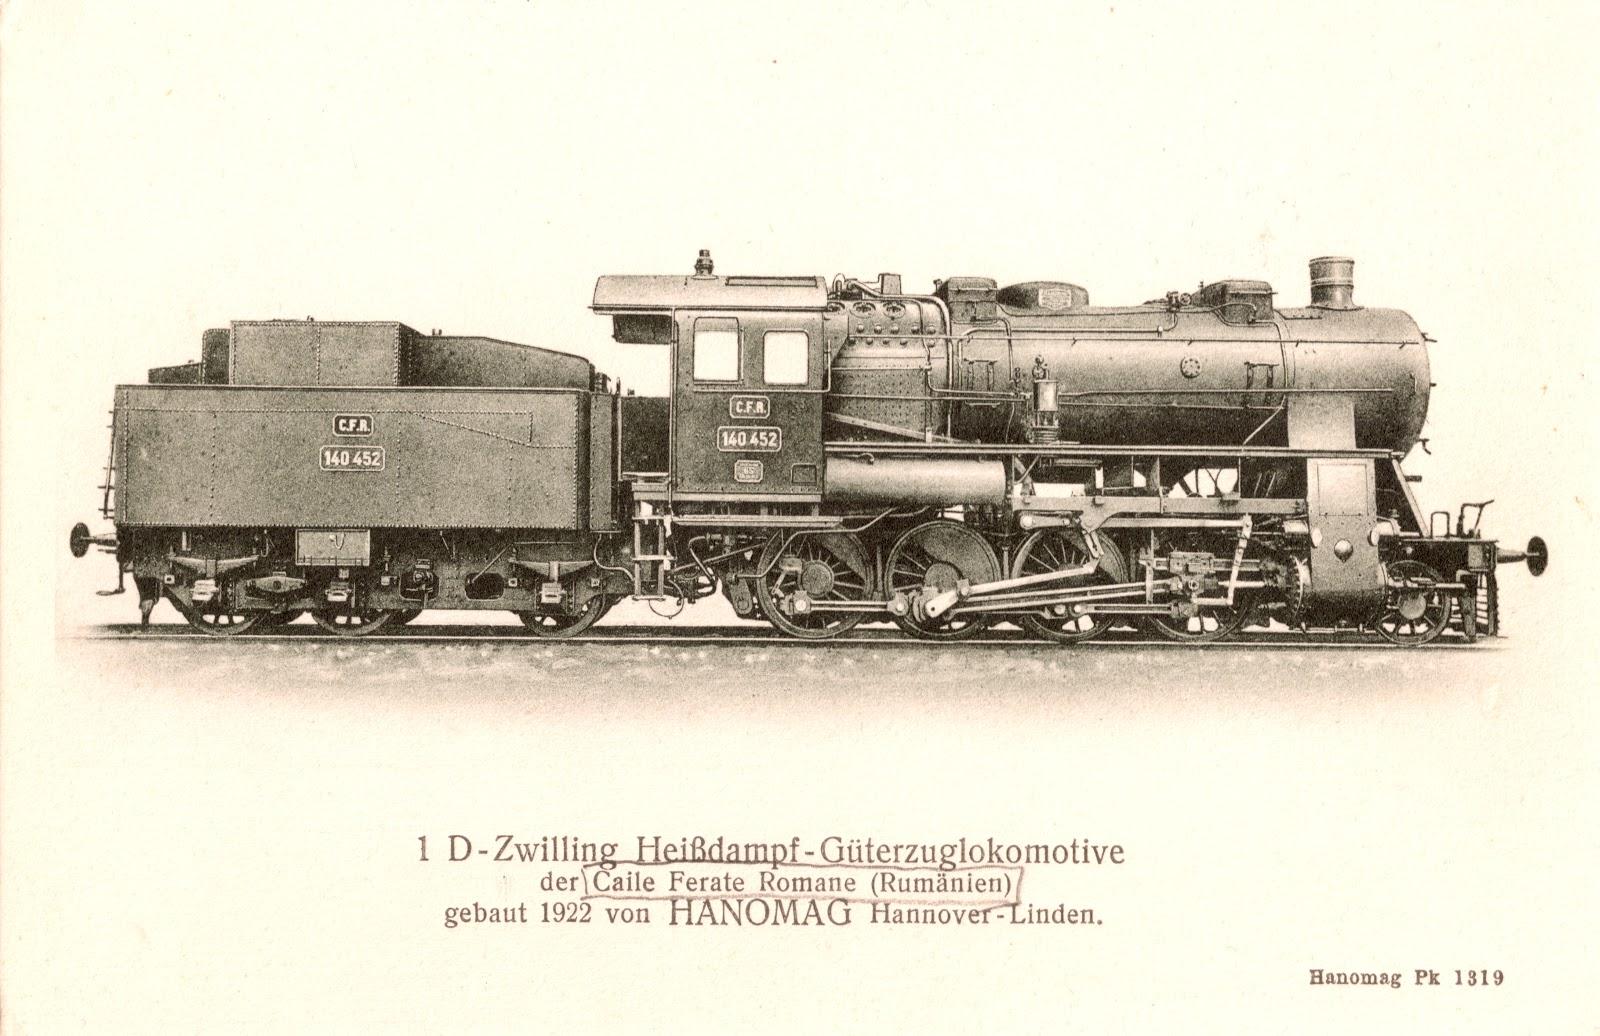 140.452+-+Hannovra+-+1922.jpg